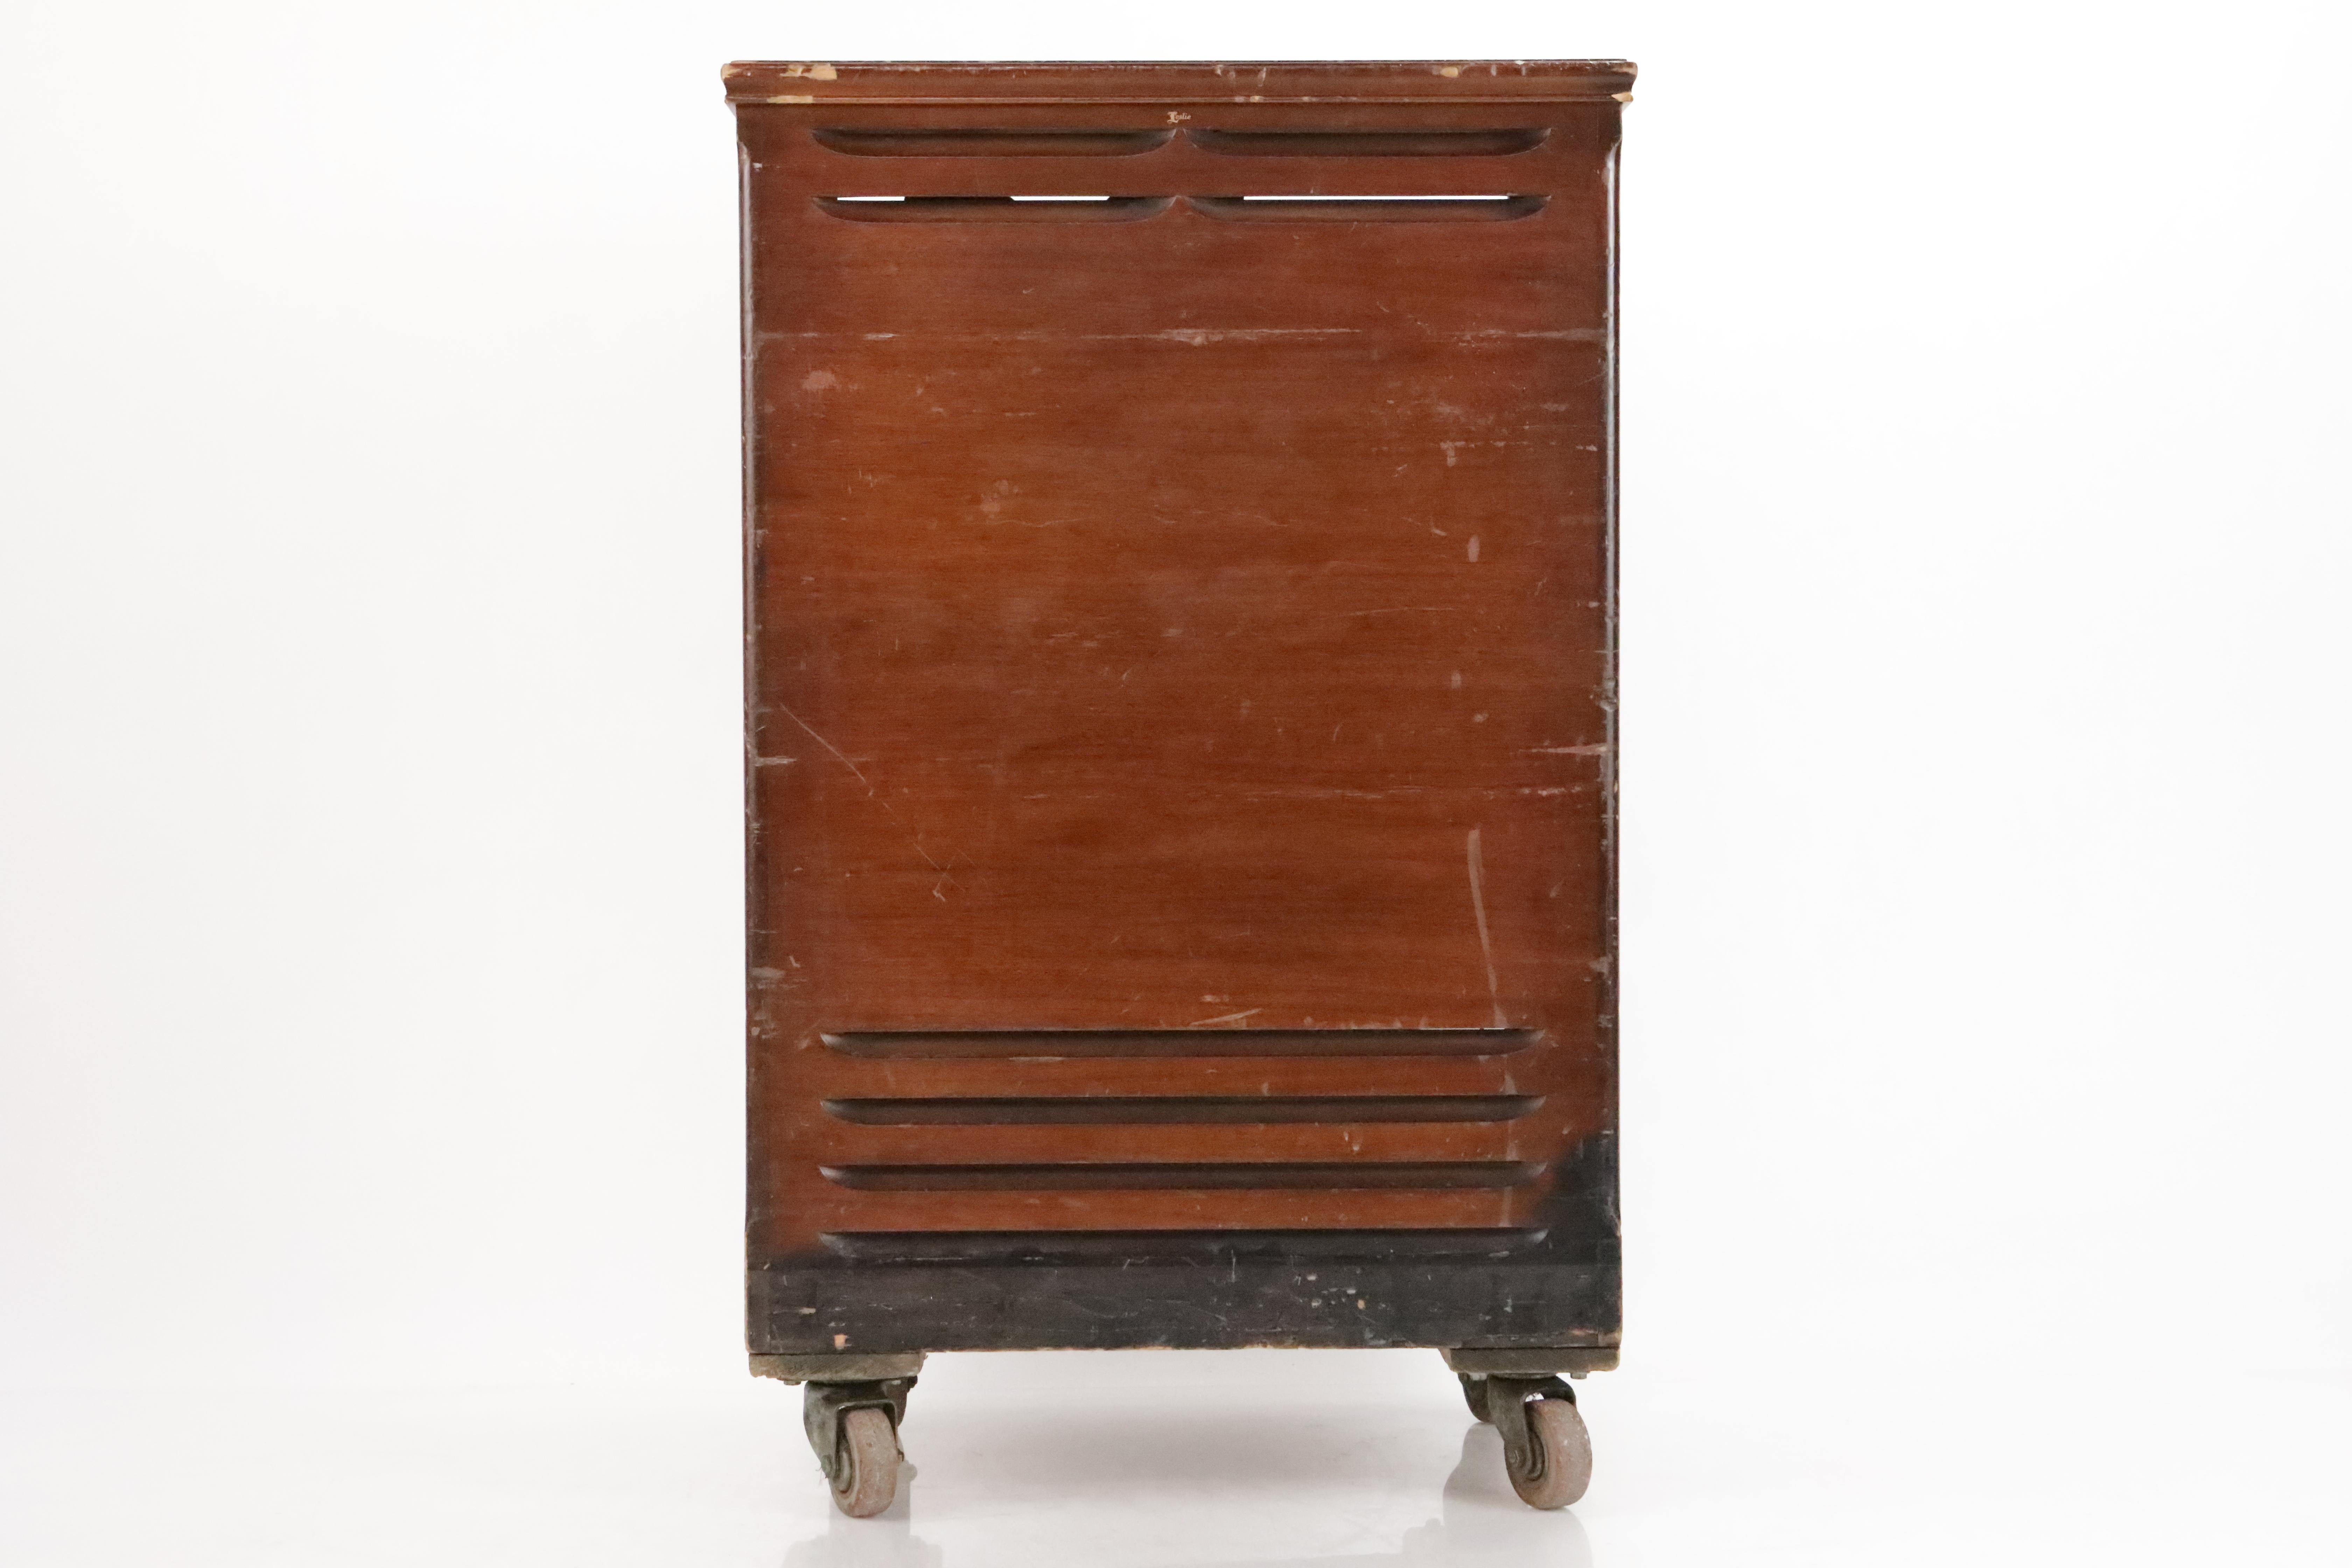 Leslie Model 122 Rotating Speaker Cabinet Cab Organ Amplifier w/ Casters #34786